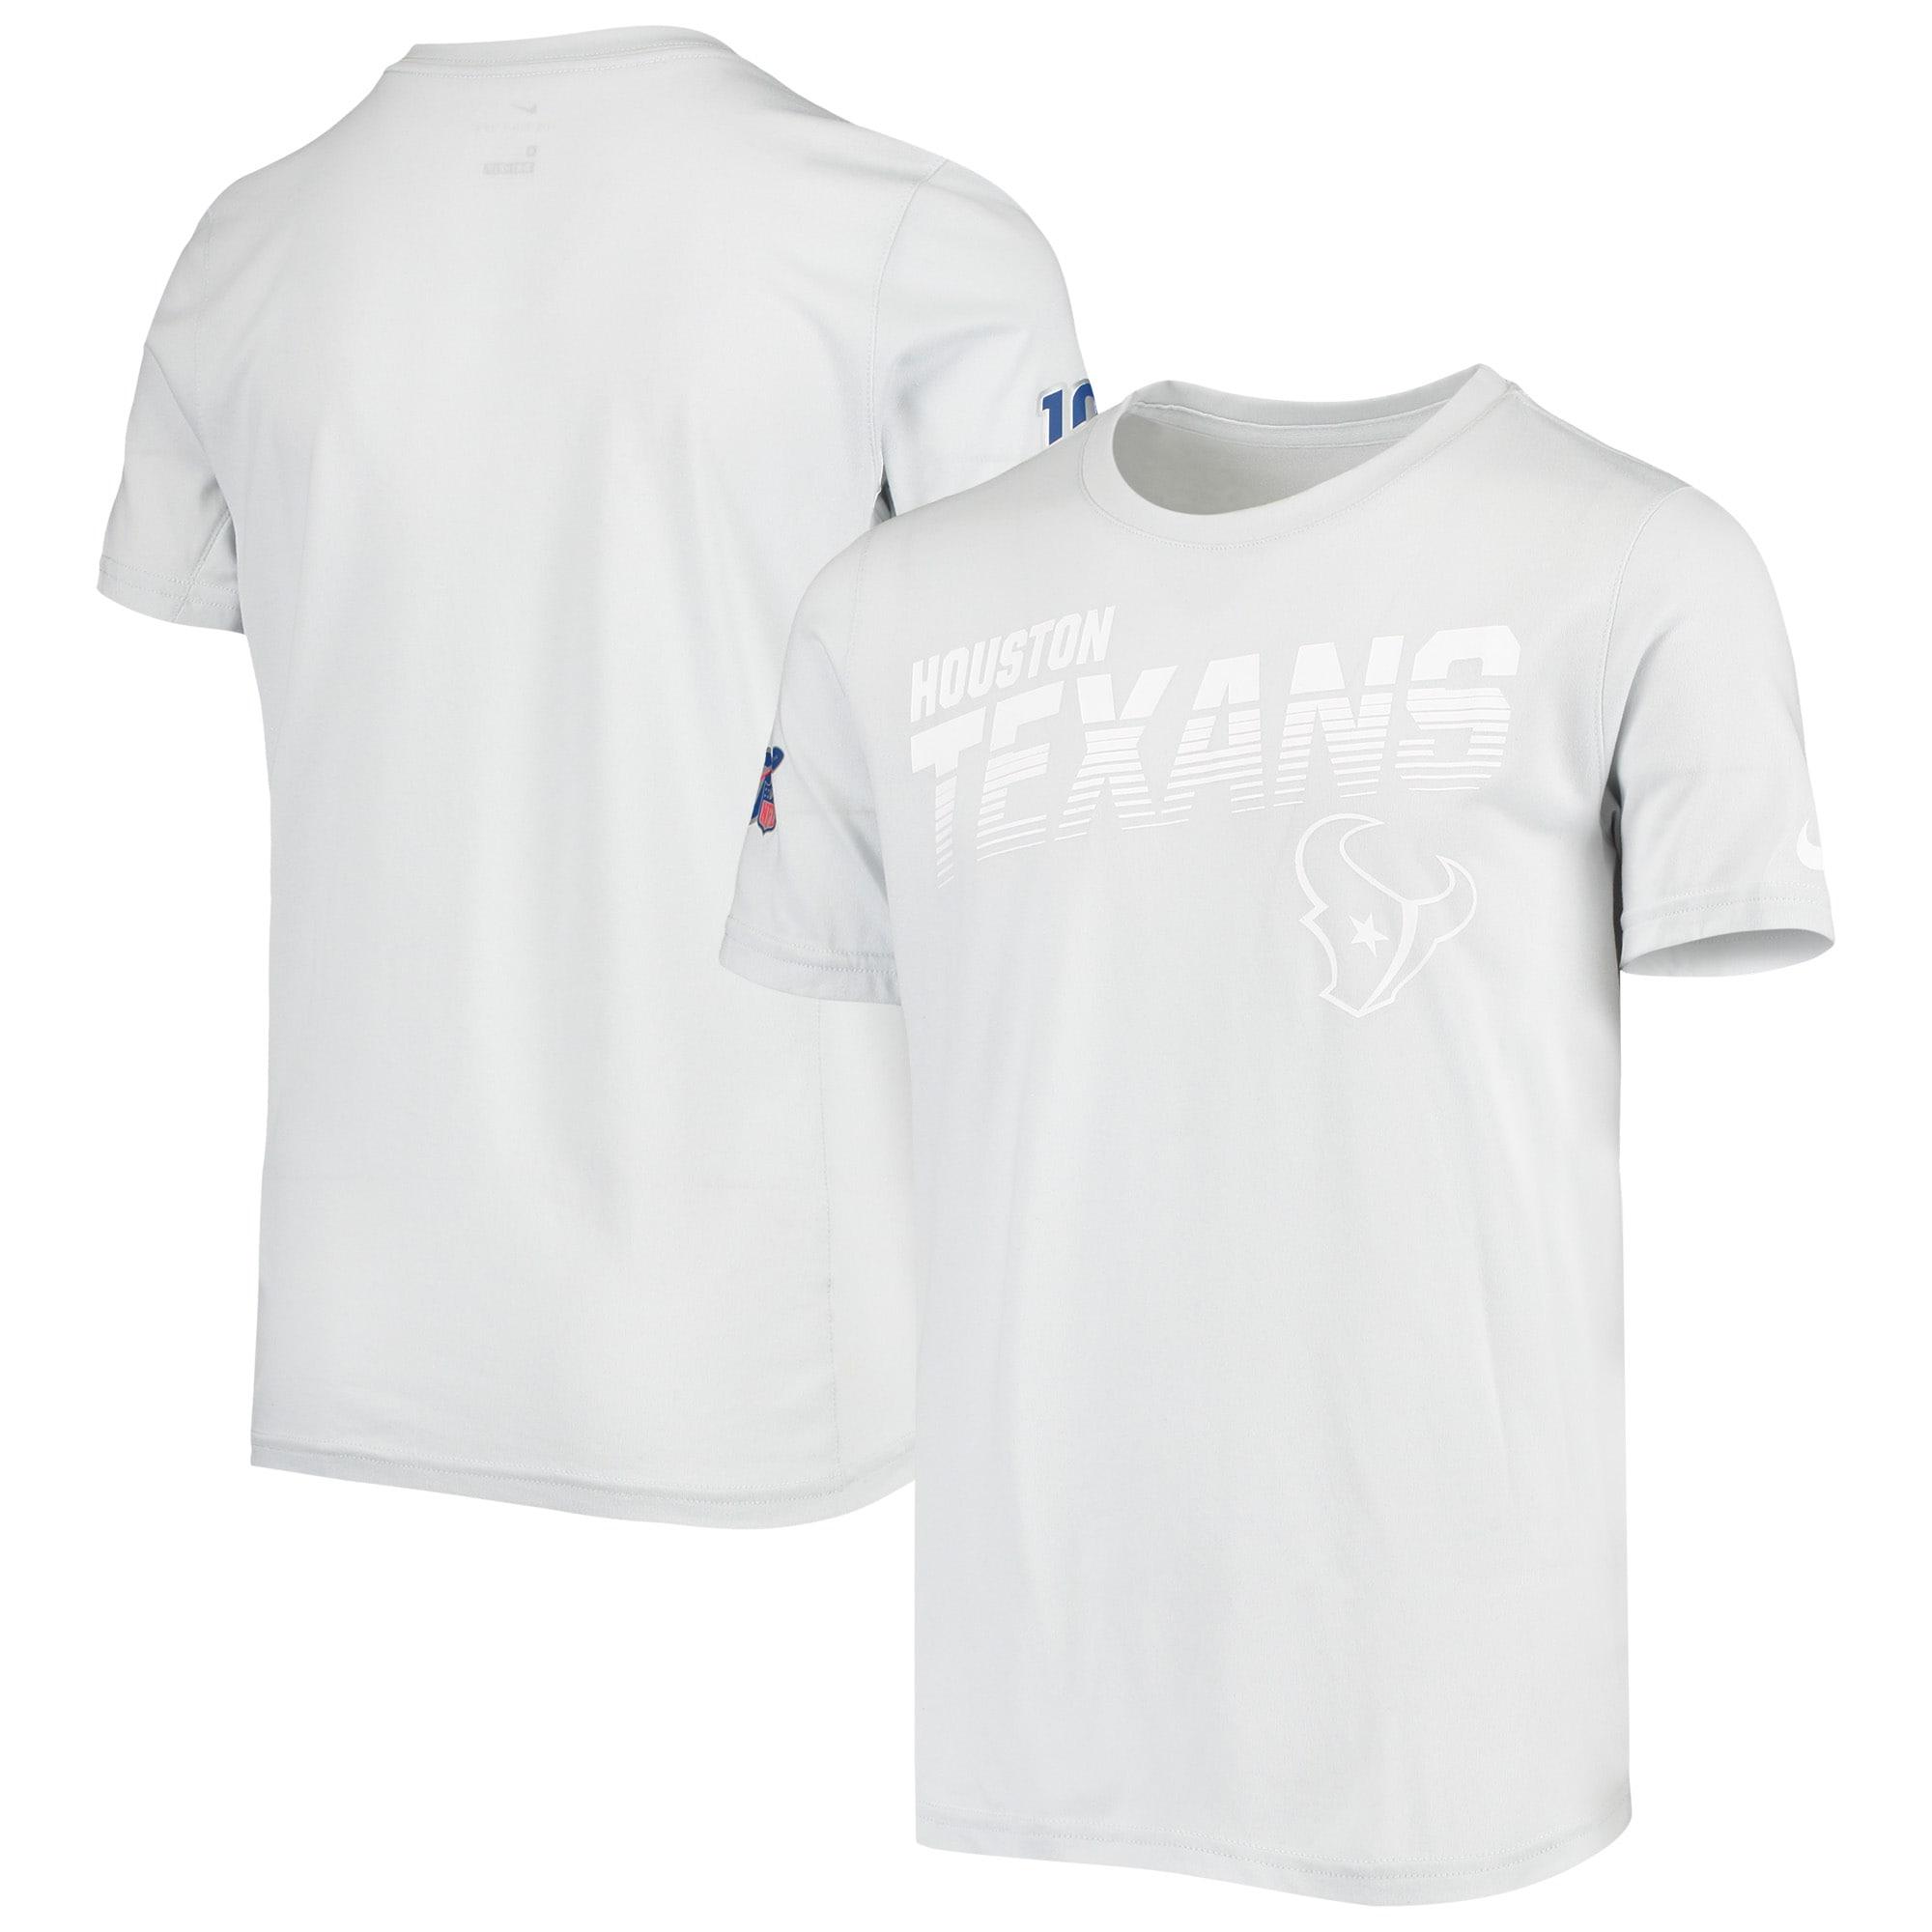 Houston Texans Nike Youth NFL 100 2019 Sideline Platinum Performance T-Shirt - White